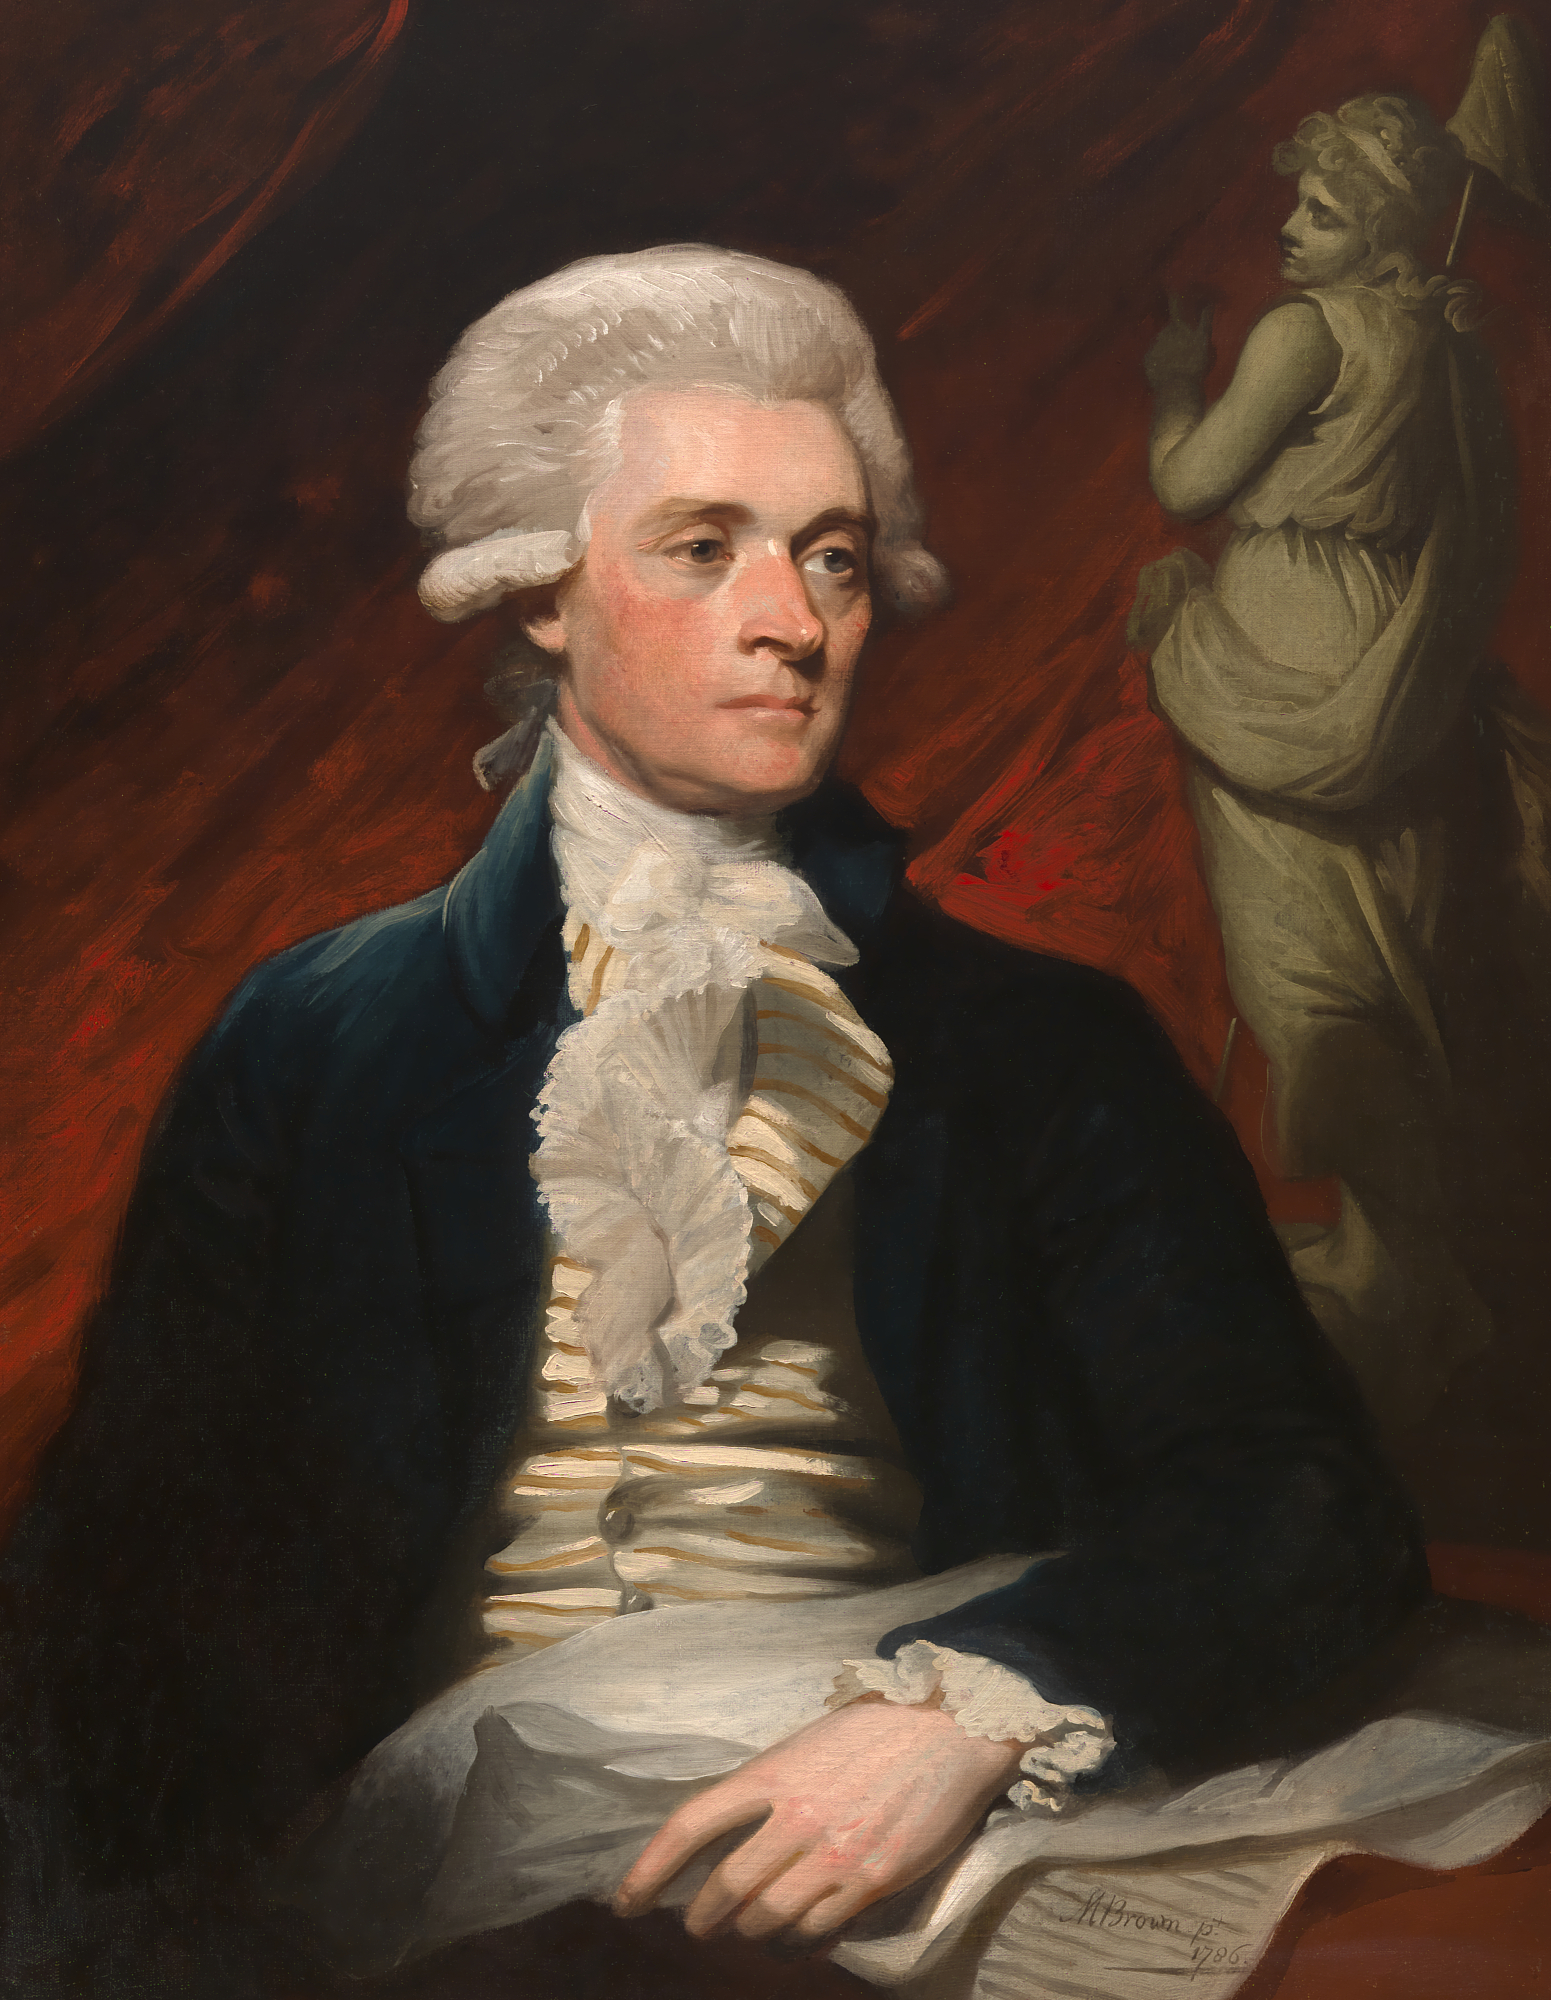 Personajes líderes históricos americanos importantes, Thomas Jefferson